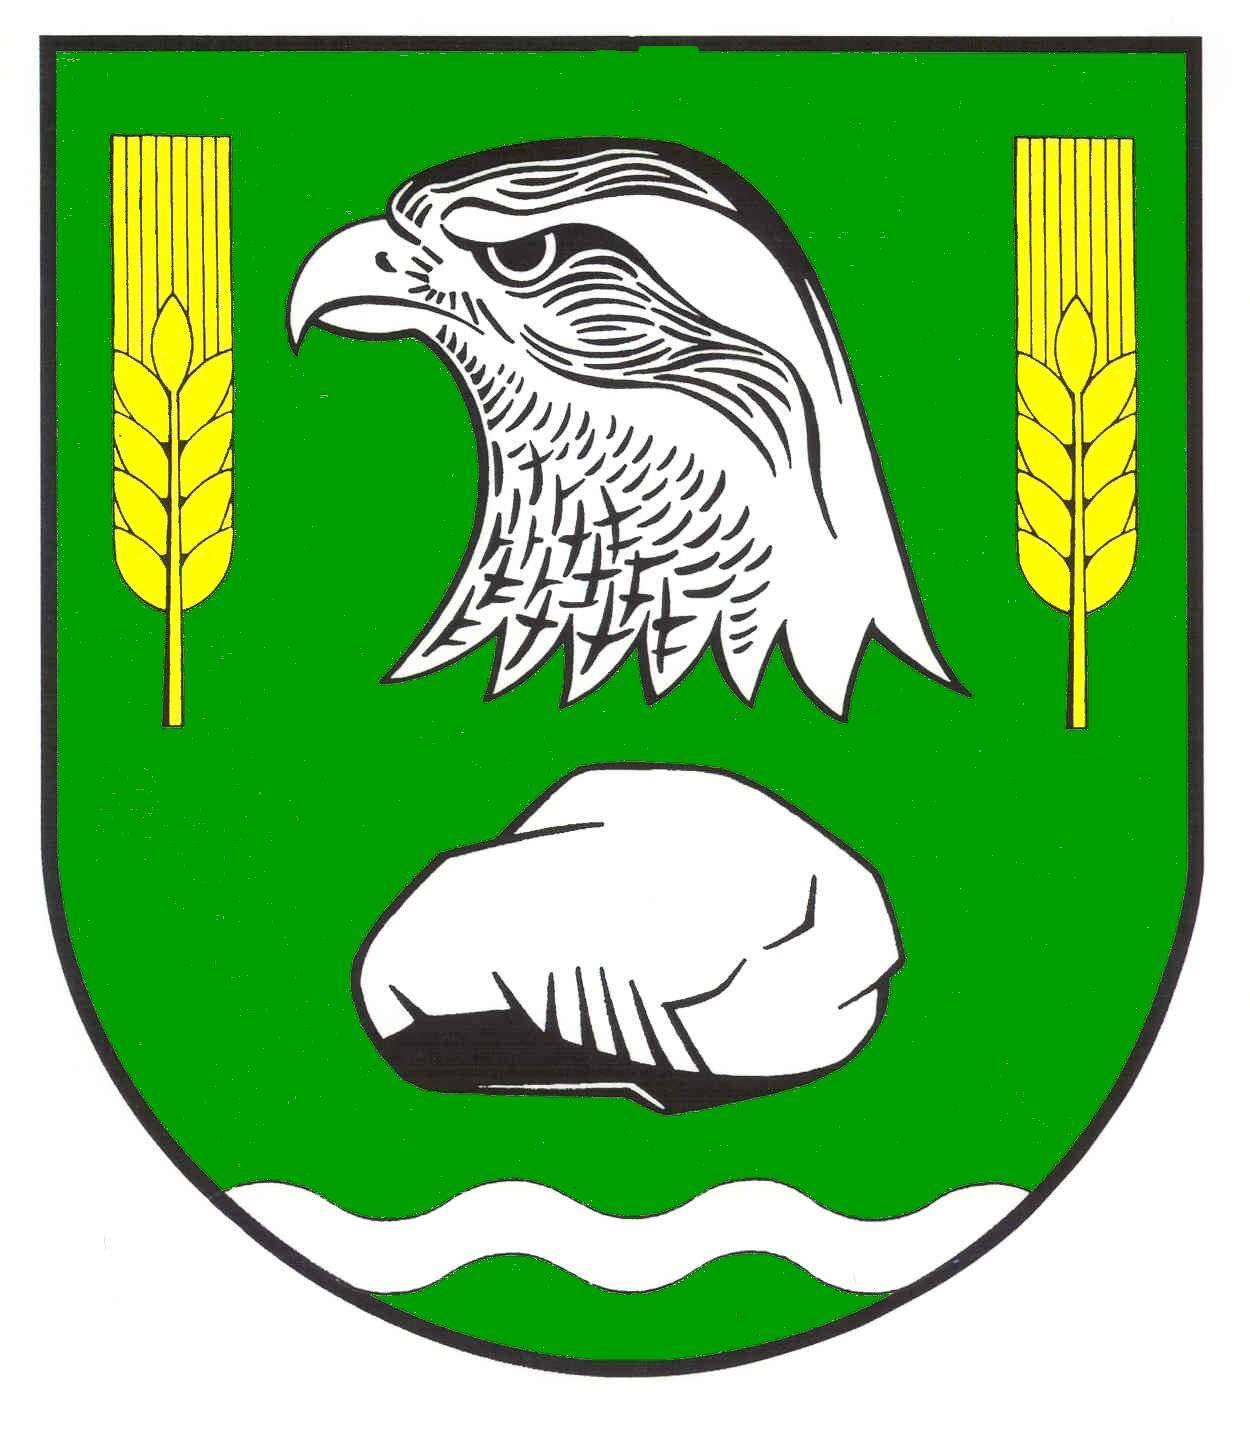 Wappen GemeindeFeldhorst, Kreis Stormarn